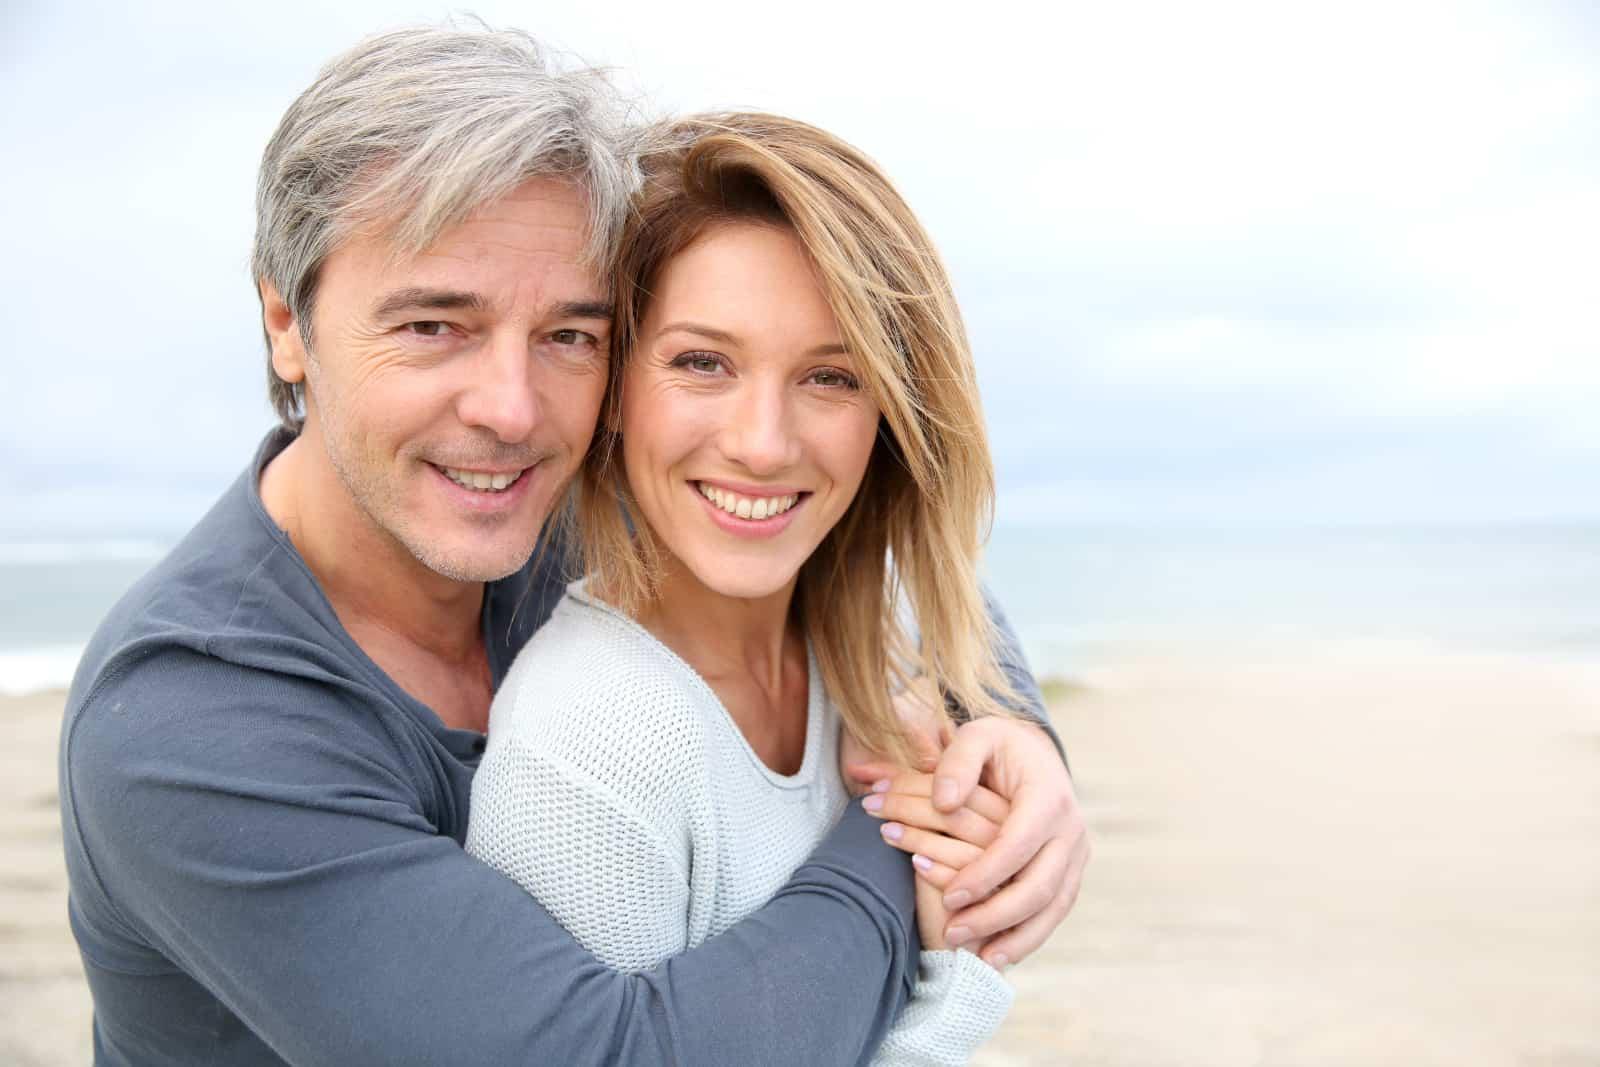 Ein Mann umarmt eine Frau am Strand